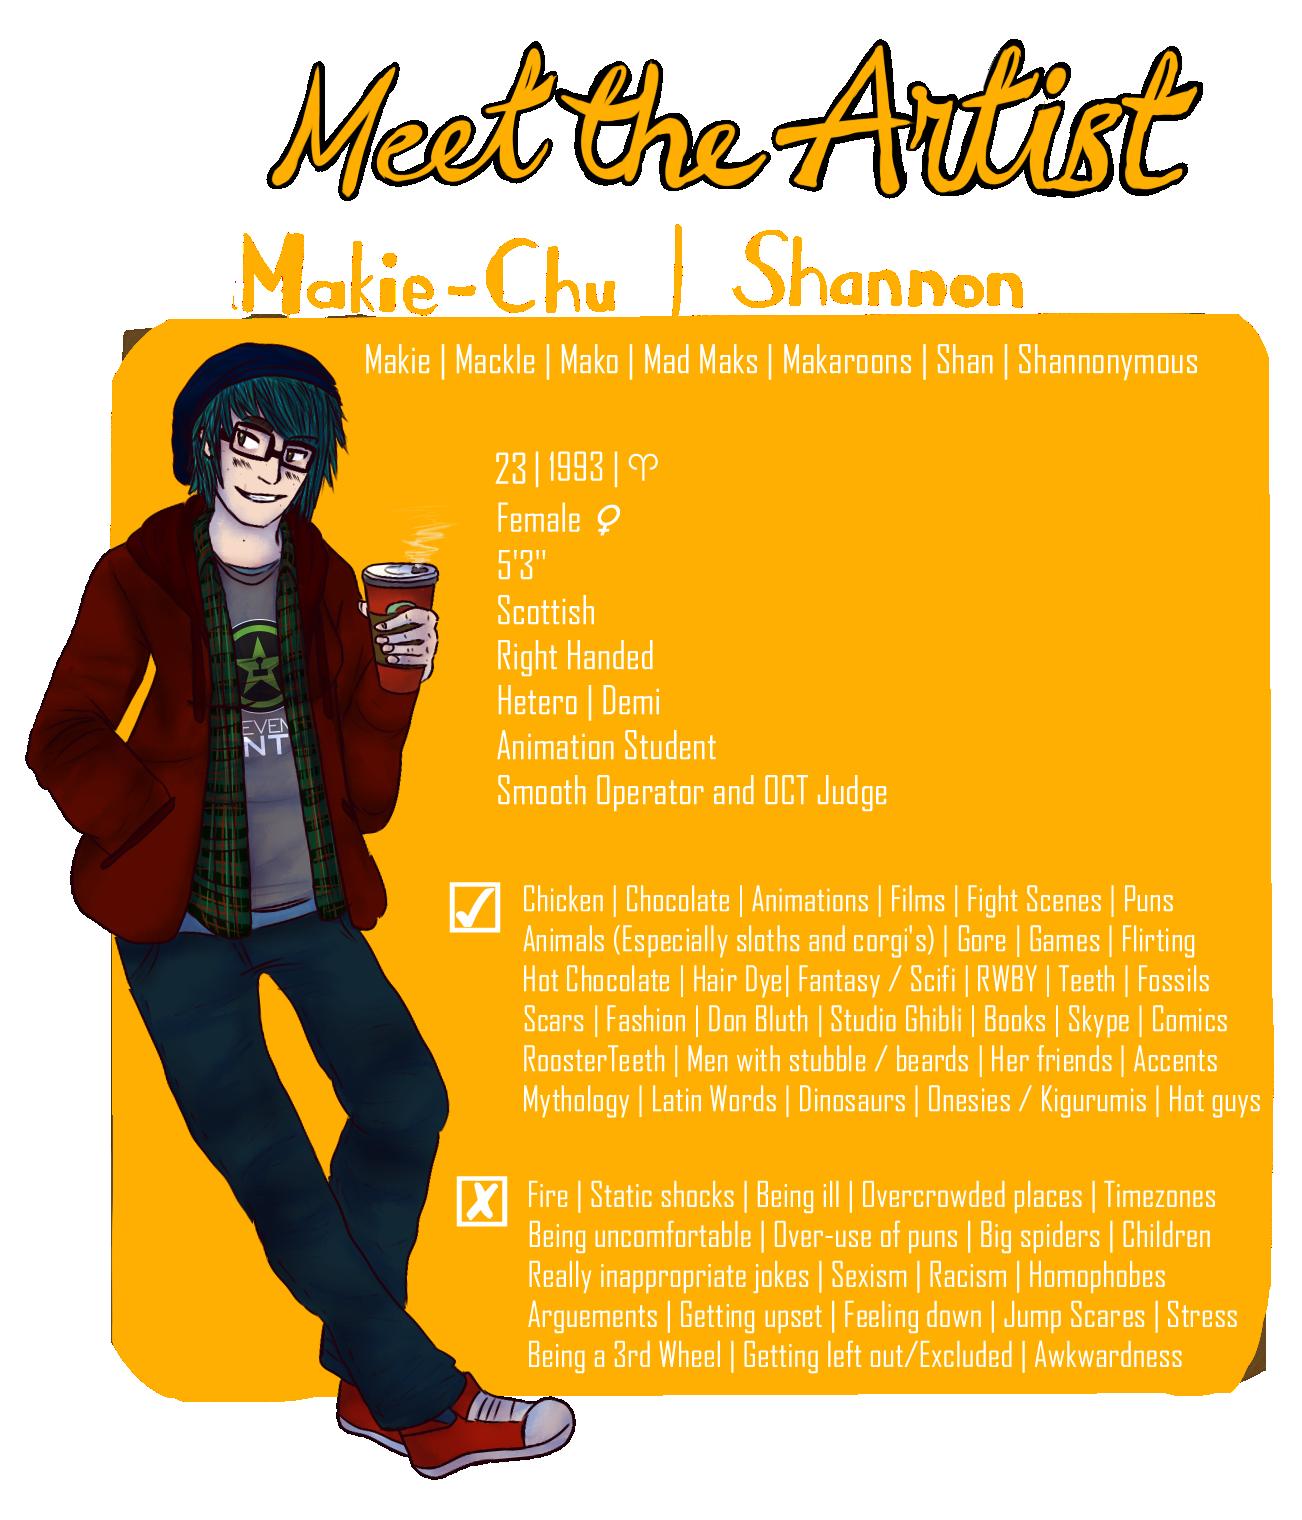 Makie-Chu's Profile Picture